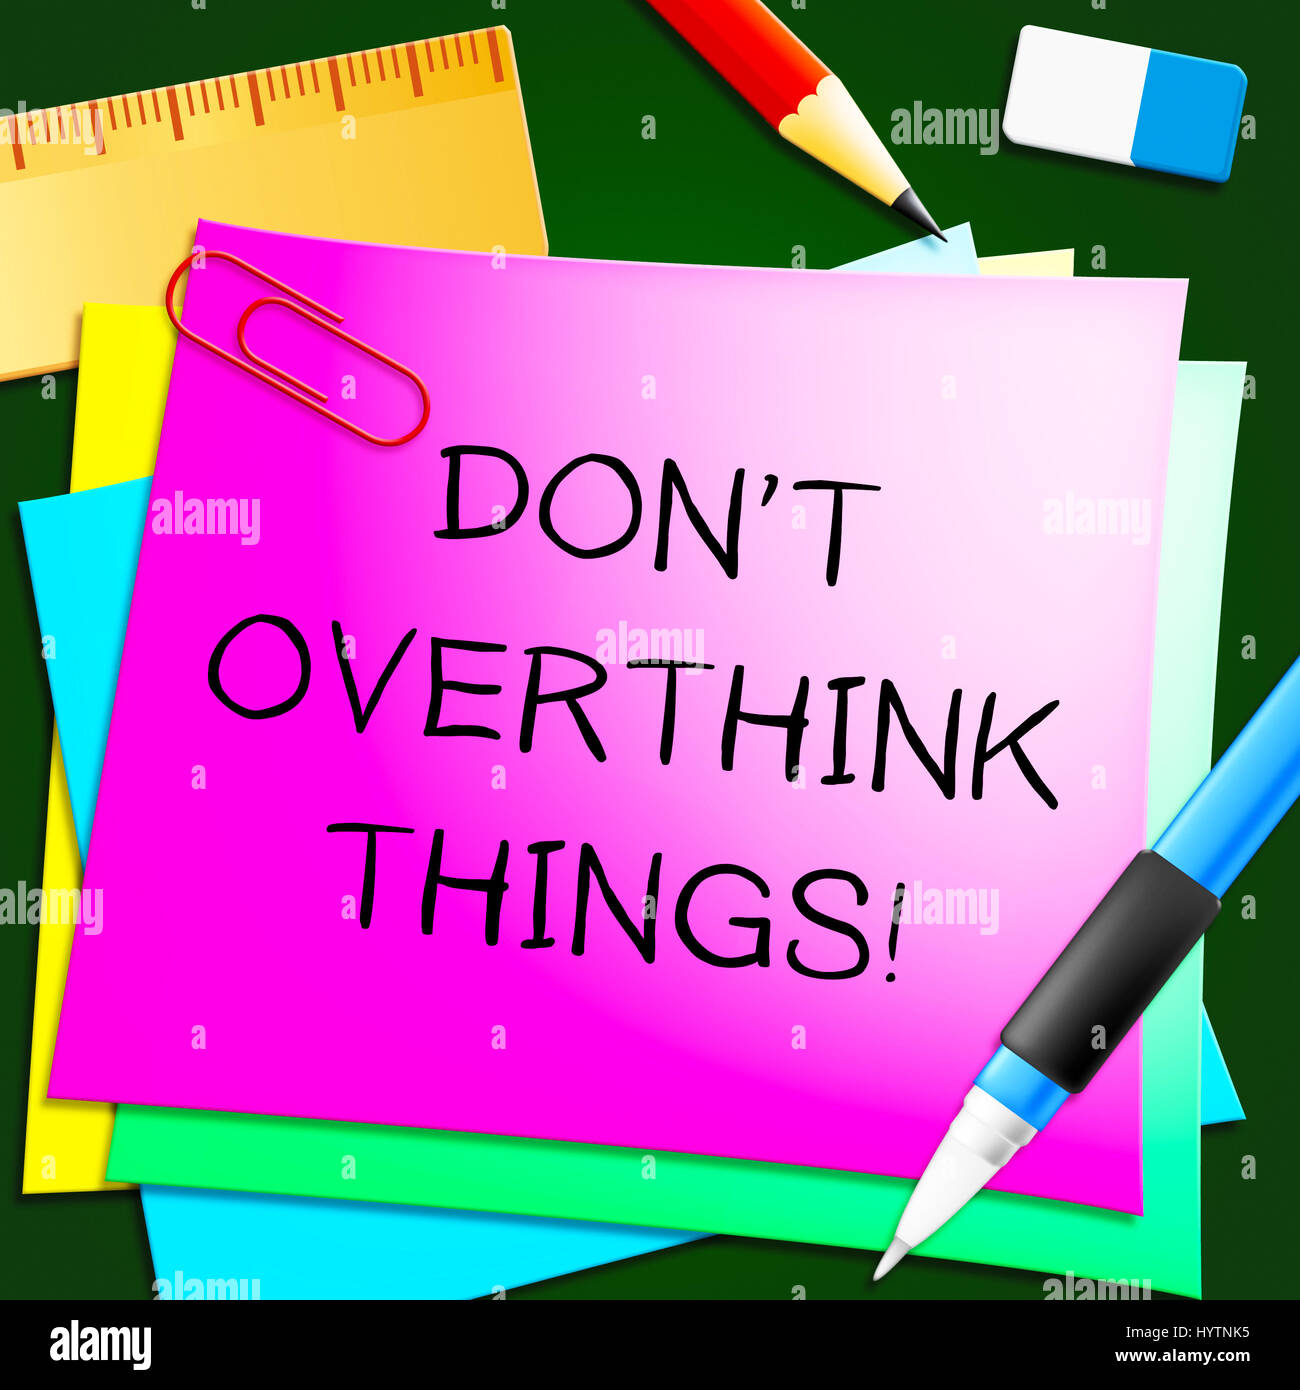 why do i overthink things